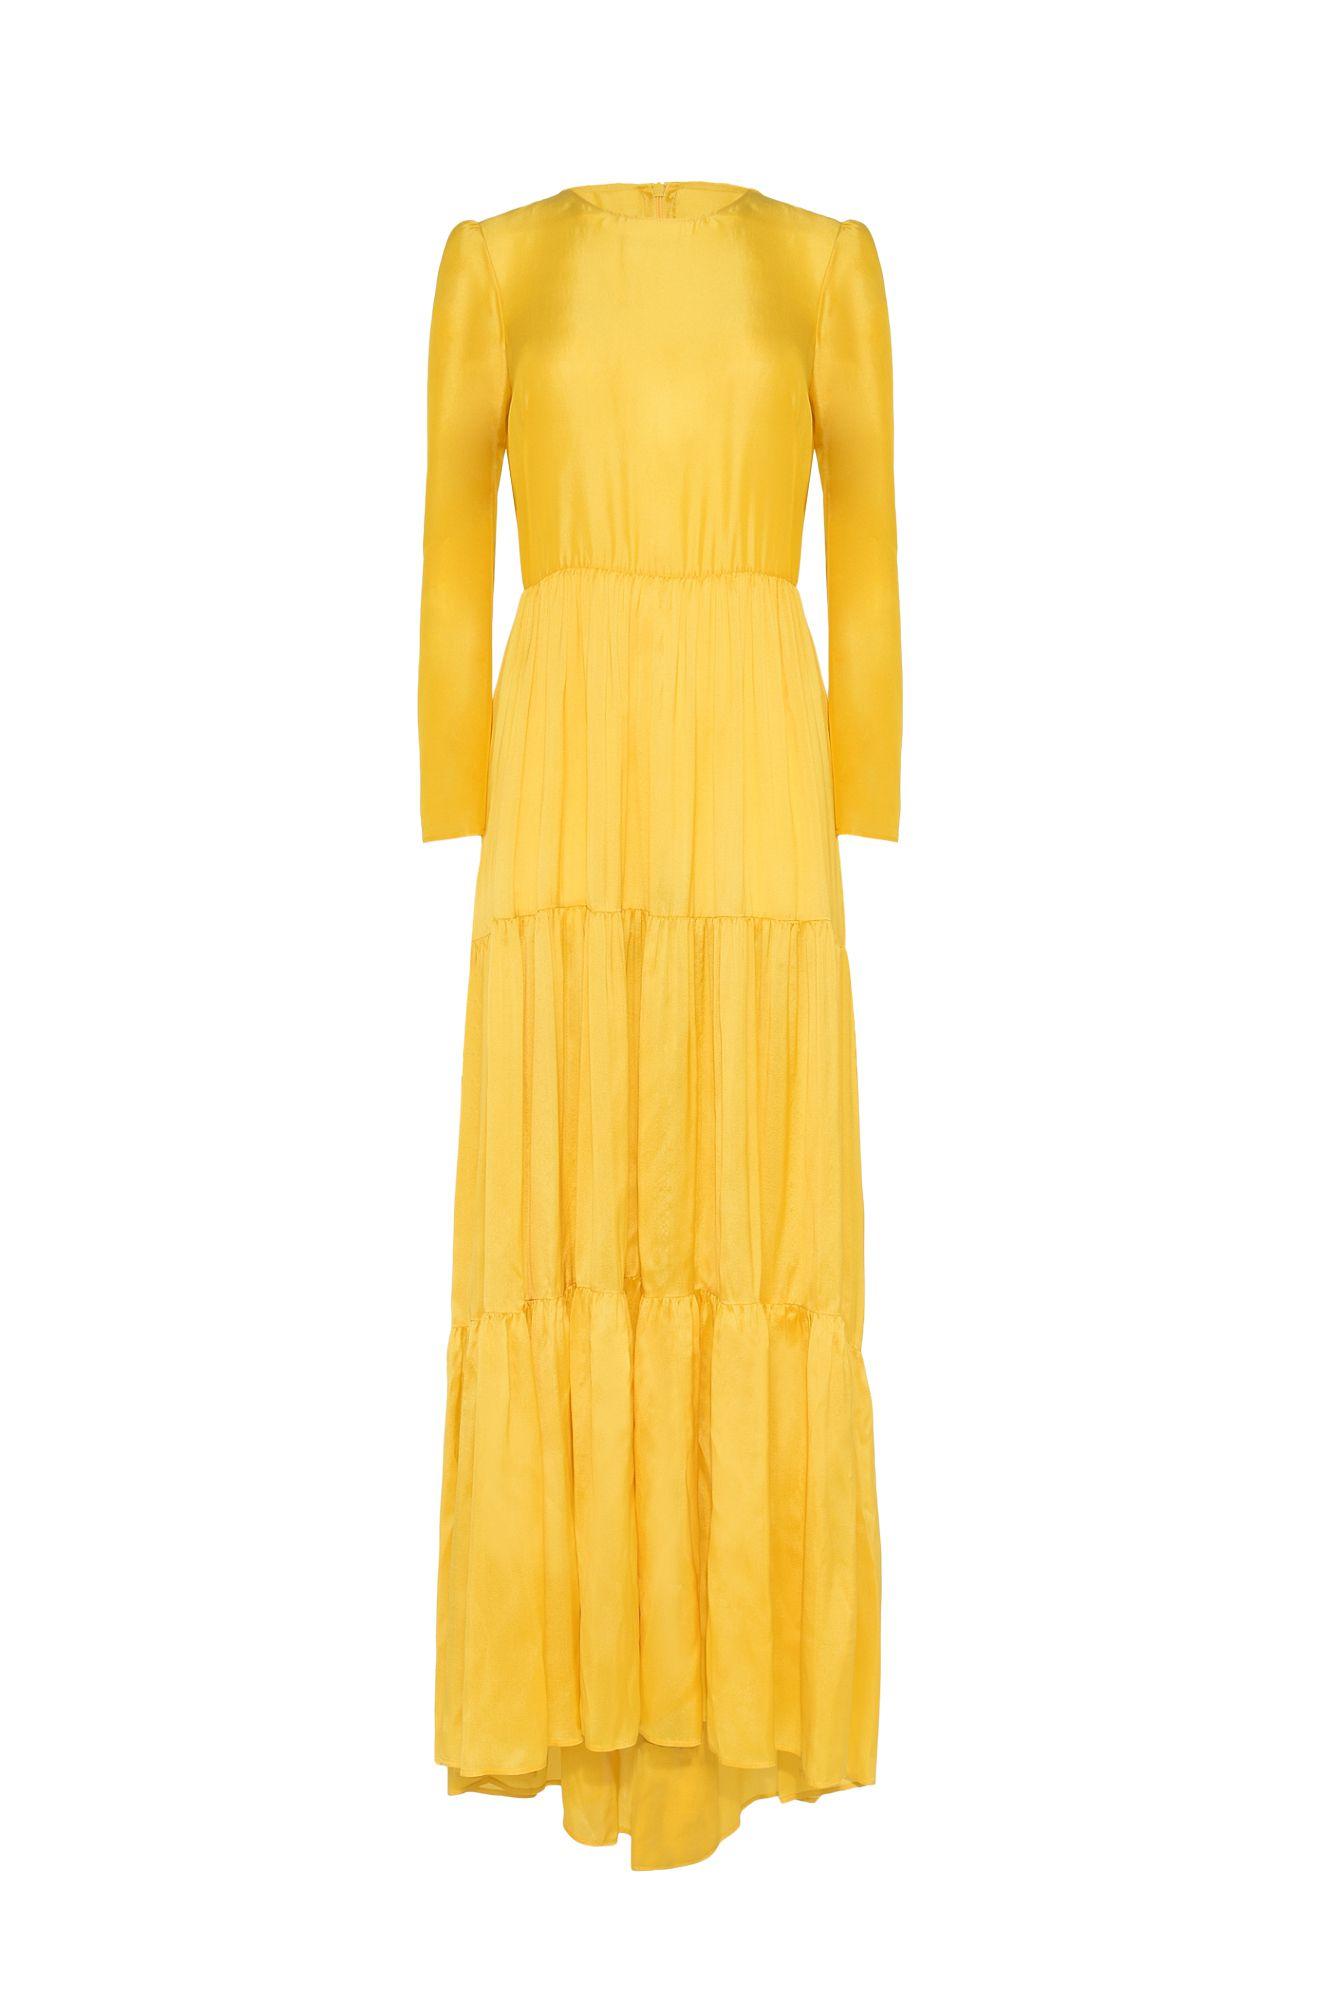 NOSTALGIC YELLOW DRESS